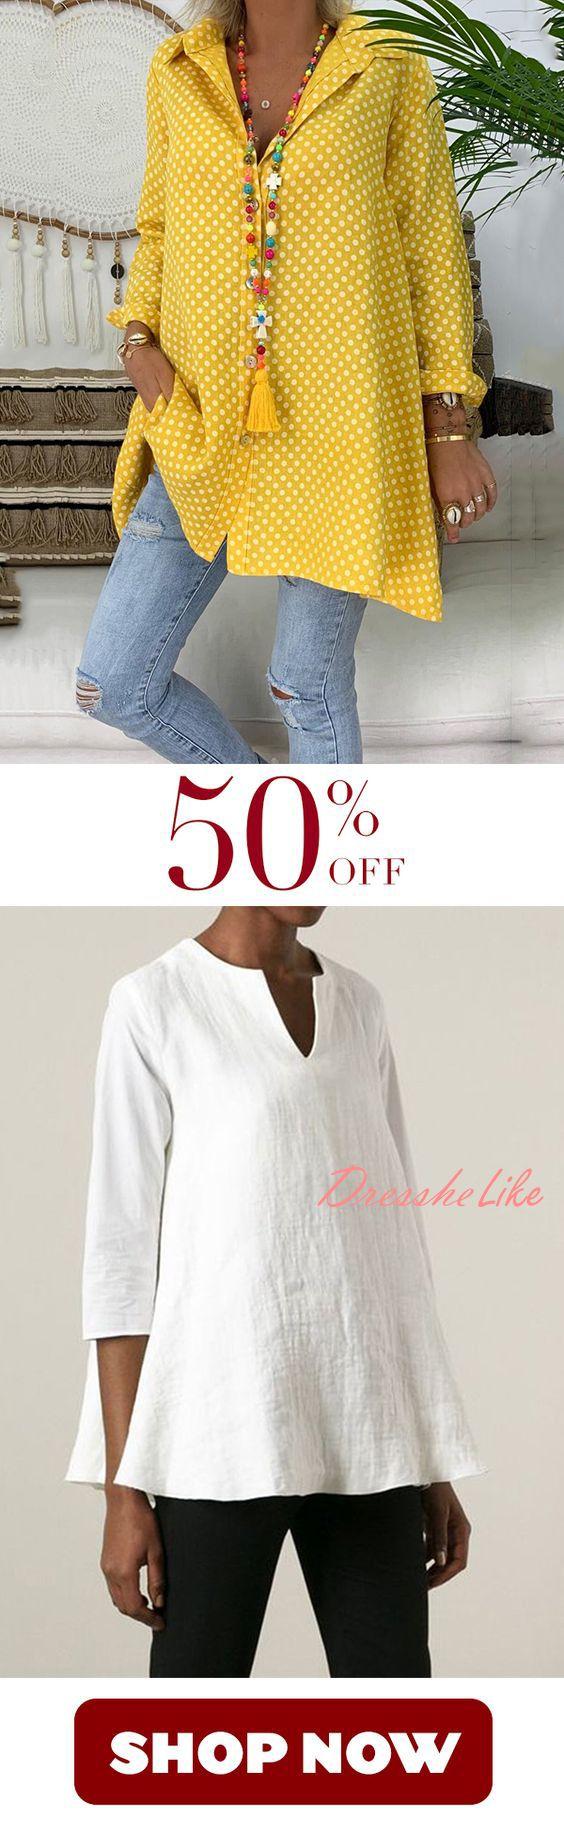 8000+ bought!!! Spring/Summer Polka Dot Cotton Printed Plus Size Shirt 1